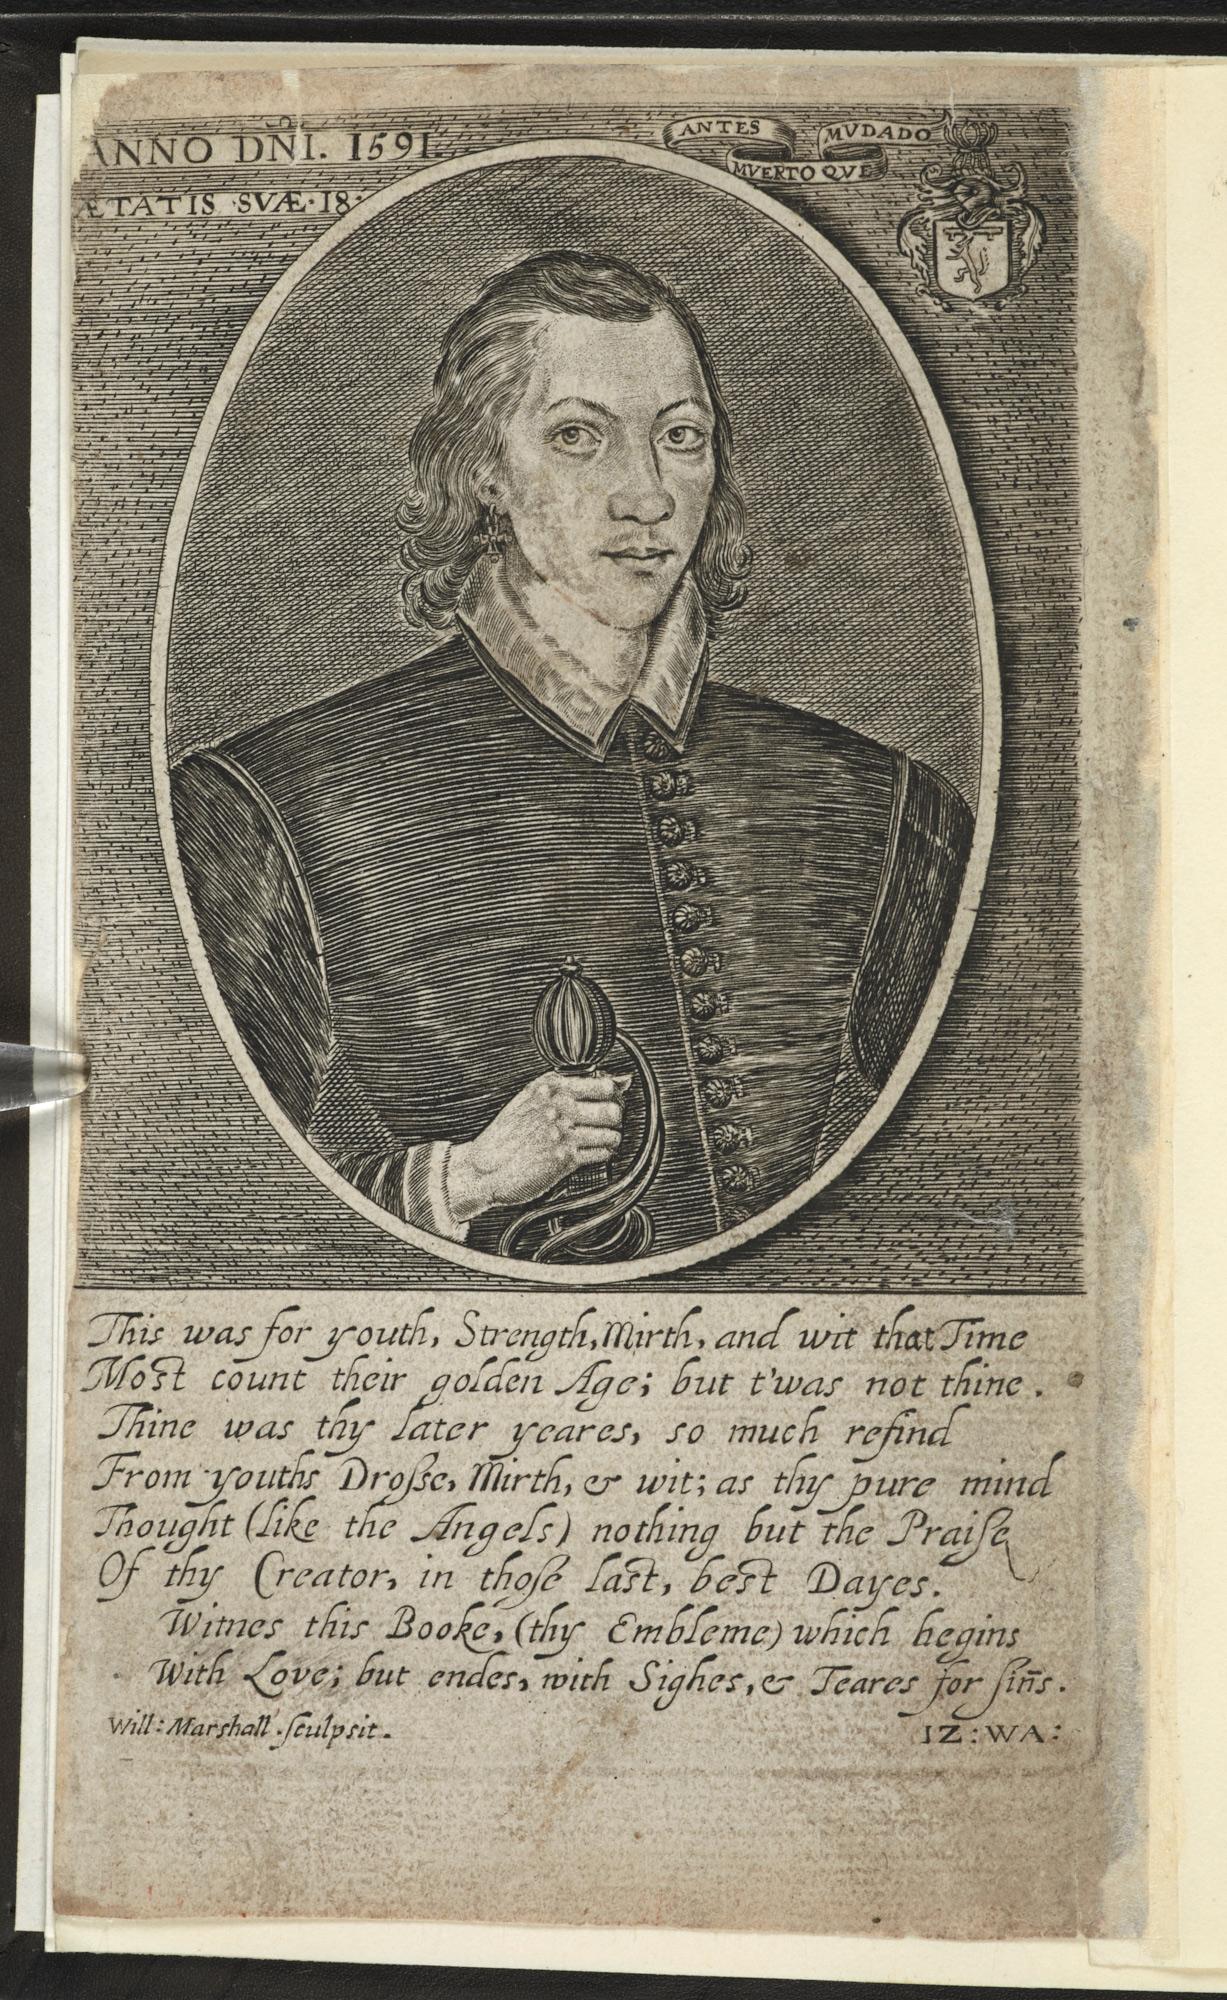 Portrait of John Donne, aged 18